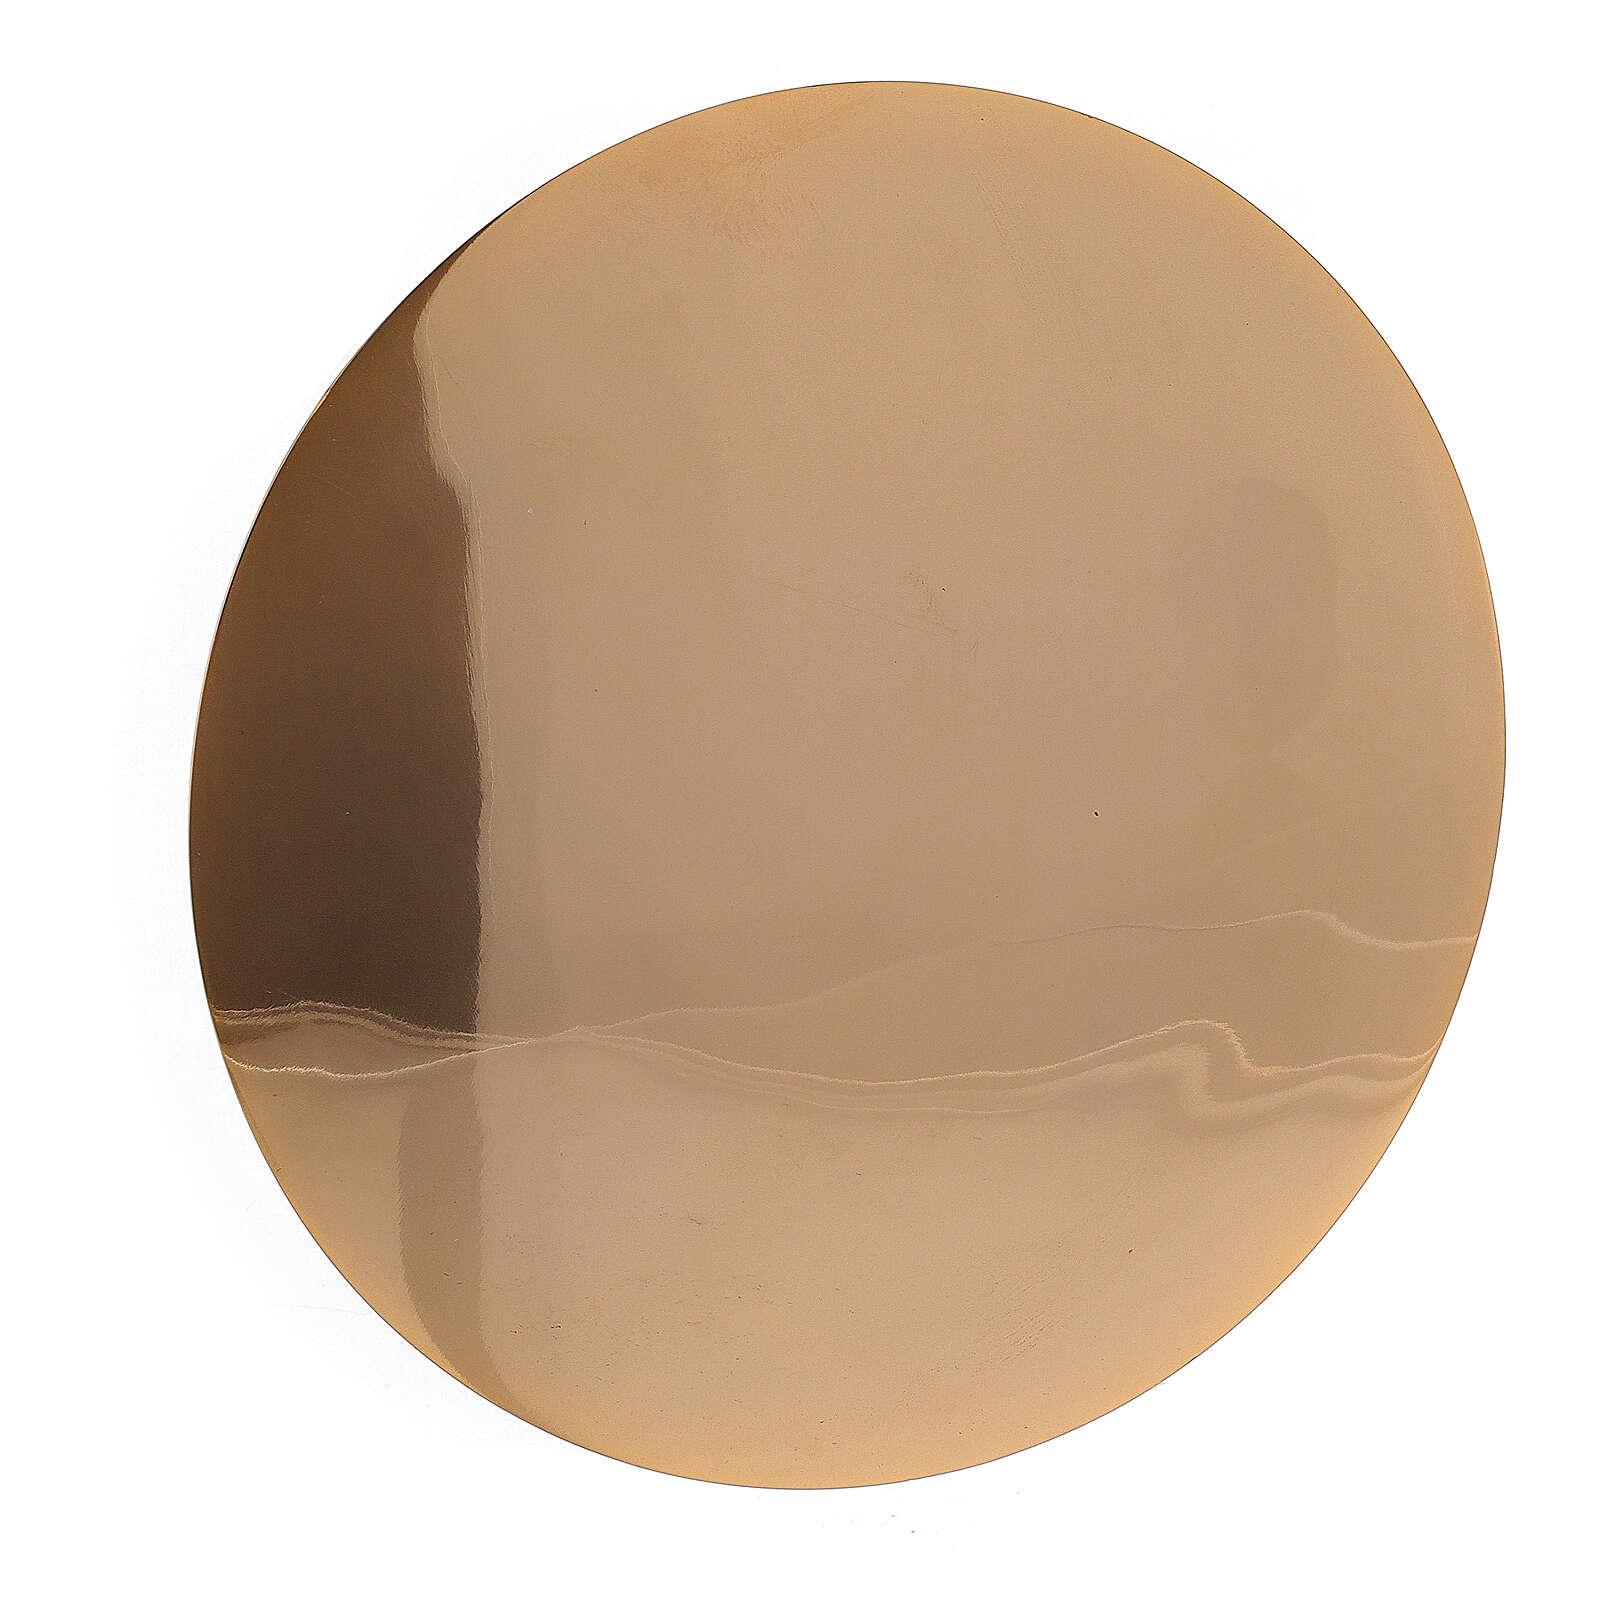 Patena latón dorado IHS inciso diámetro 12,5 cm 4